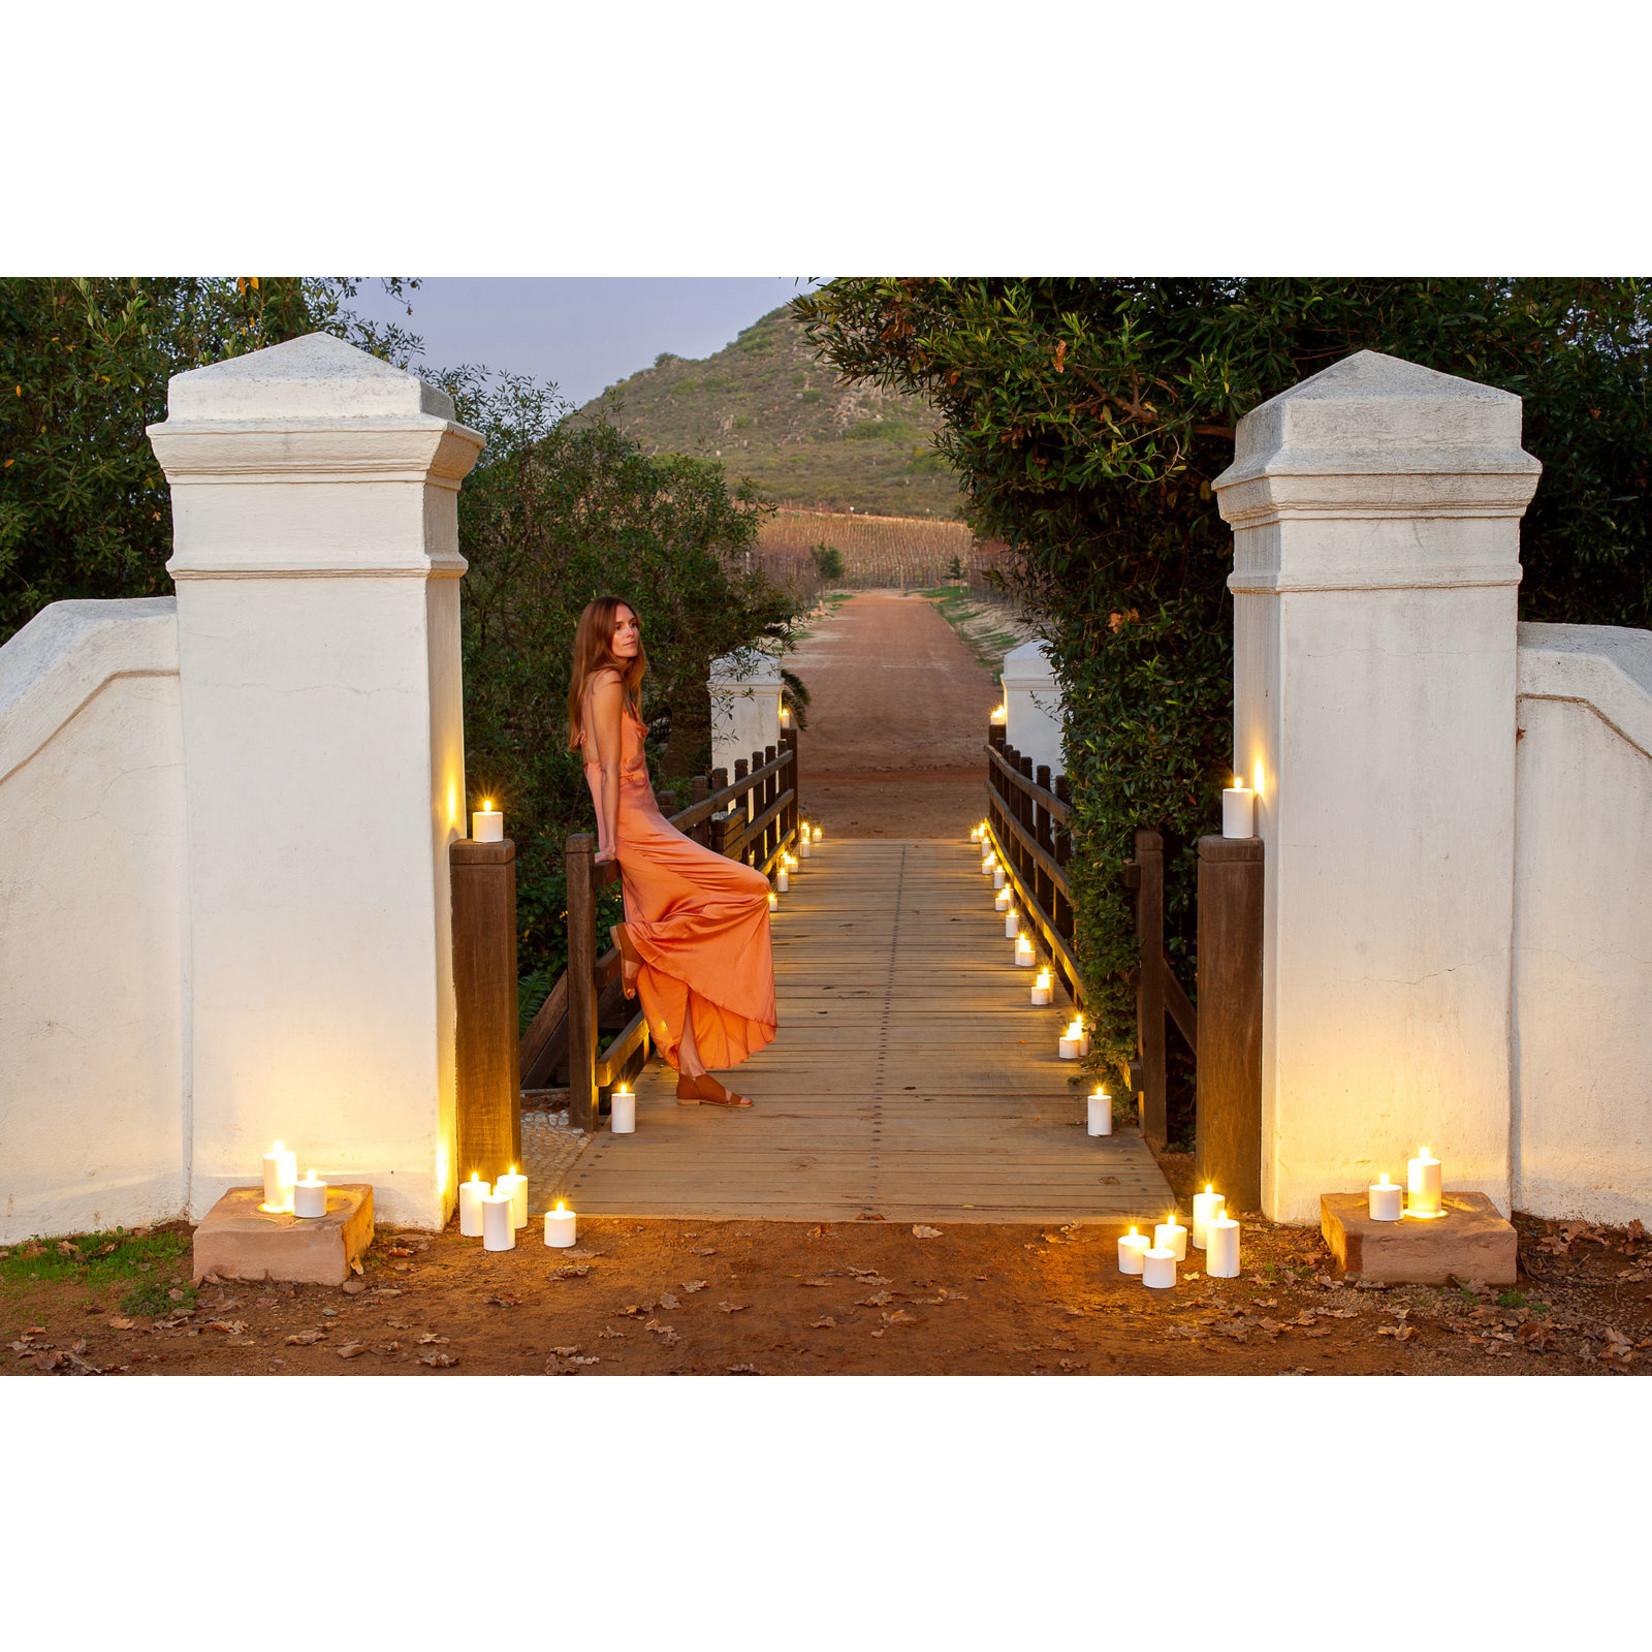 UYUNI LIGHTING Outdoor LED Pillar Candle - White - Ø7,8 x 12,7 cm